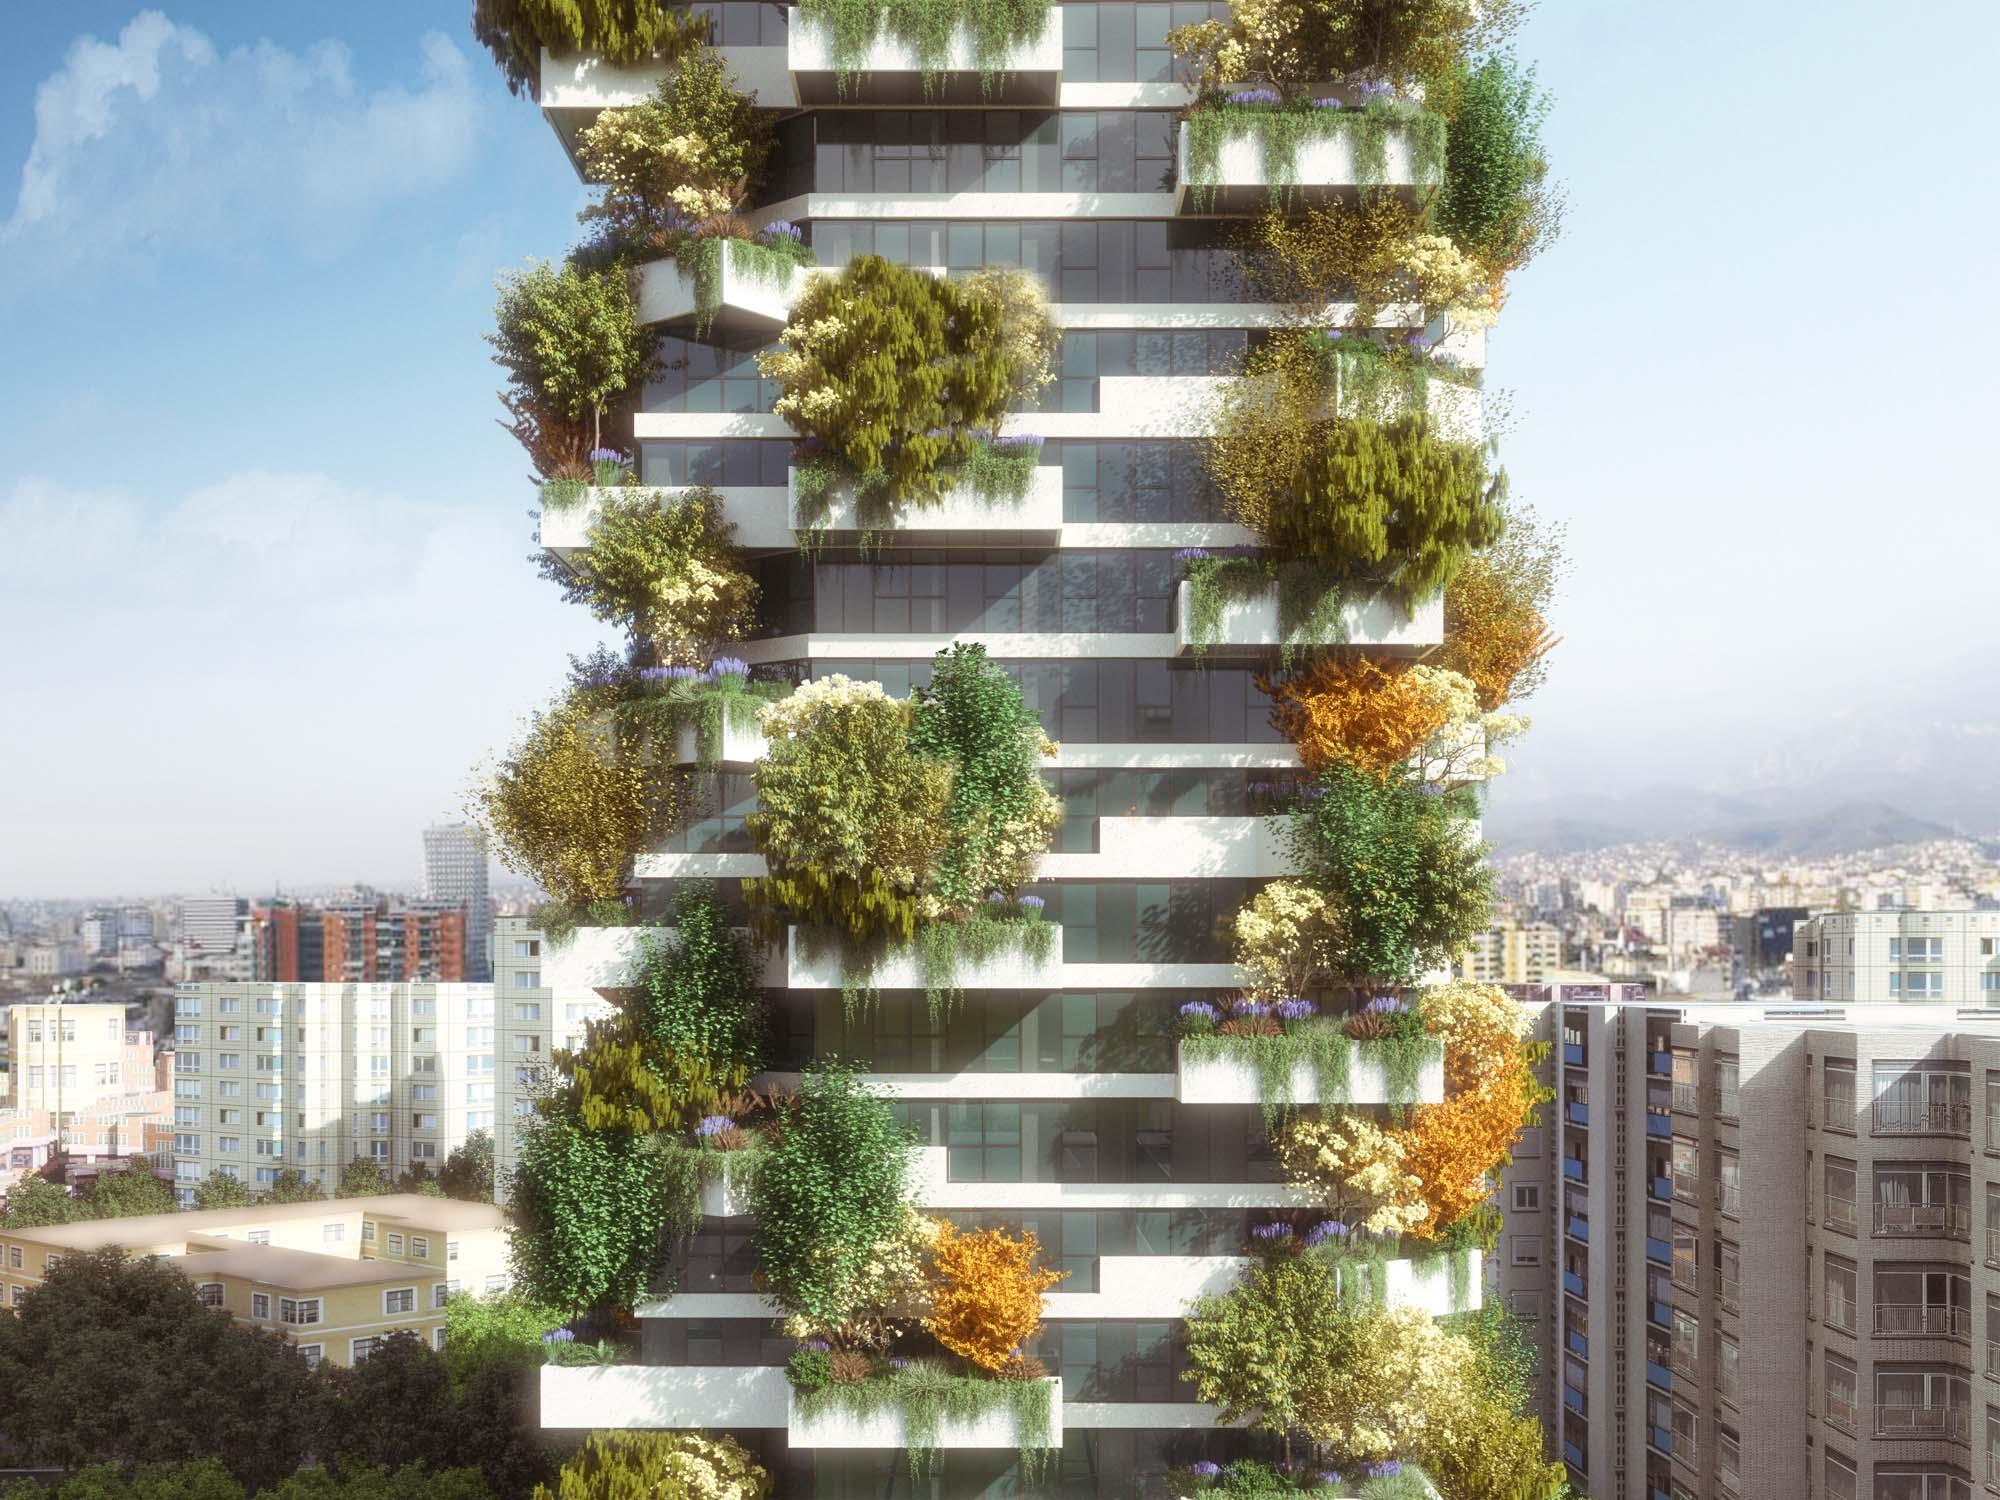 Caption: Tirana Vertical Forest designed by Stefano Boeri